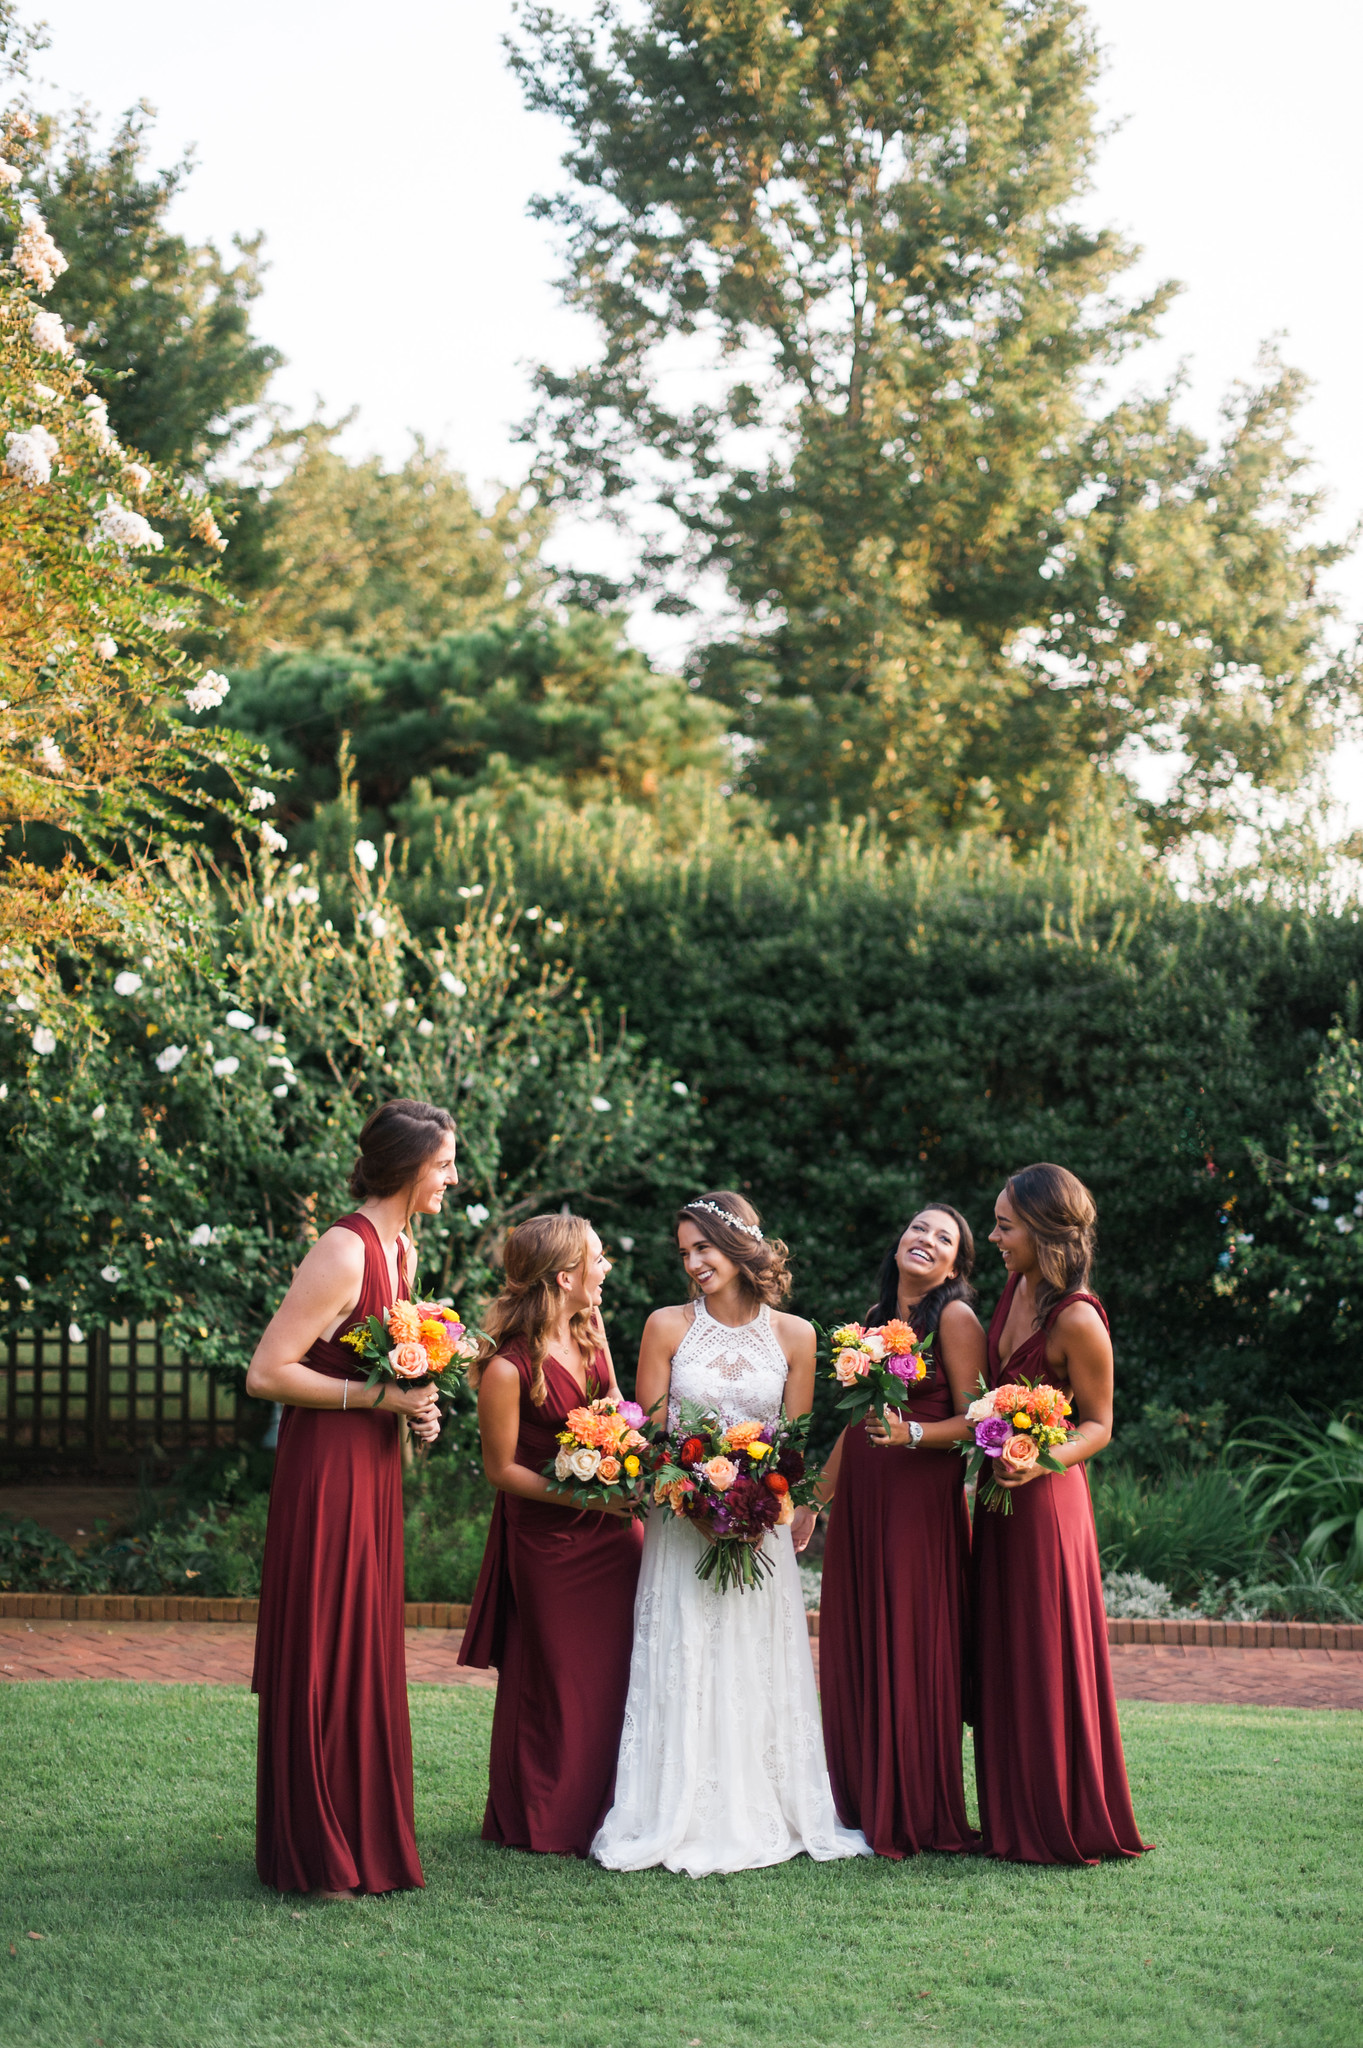 thomas-wedding-062-X4.jpg